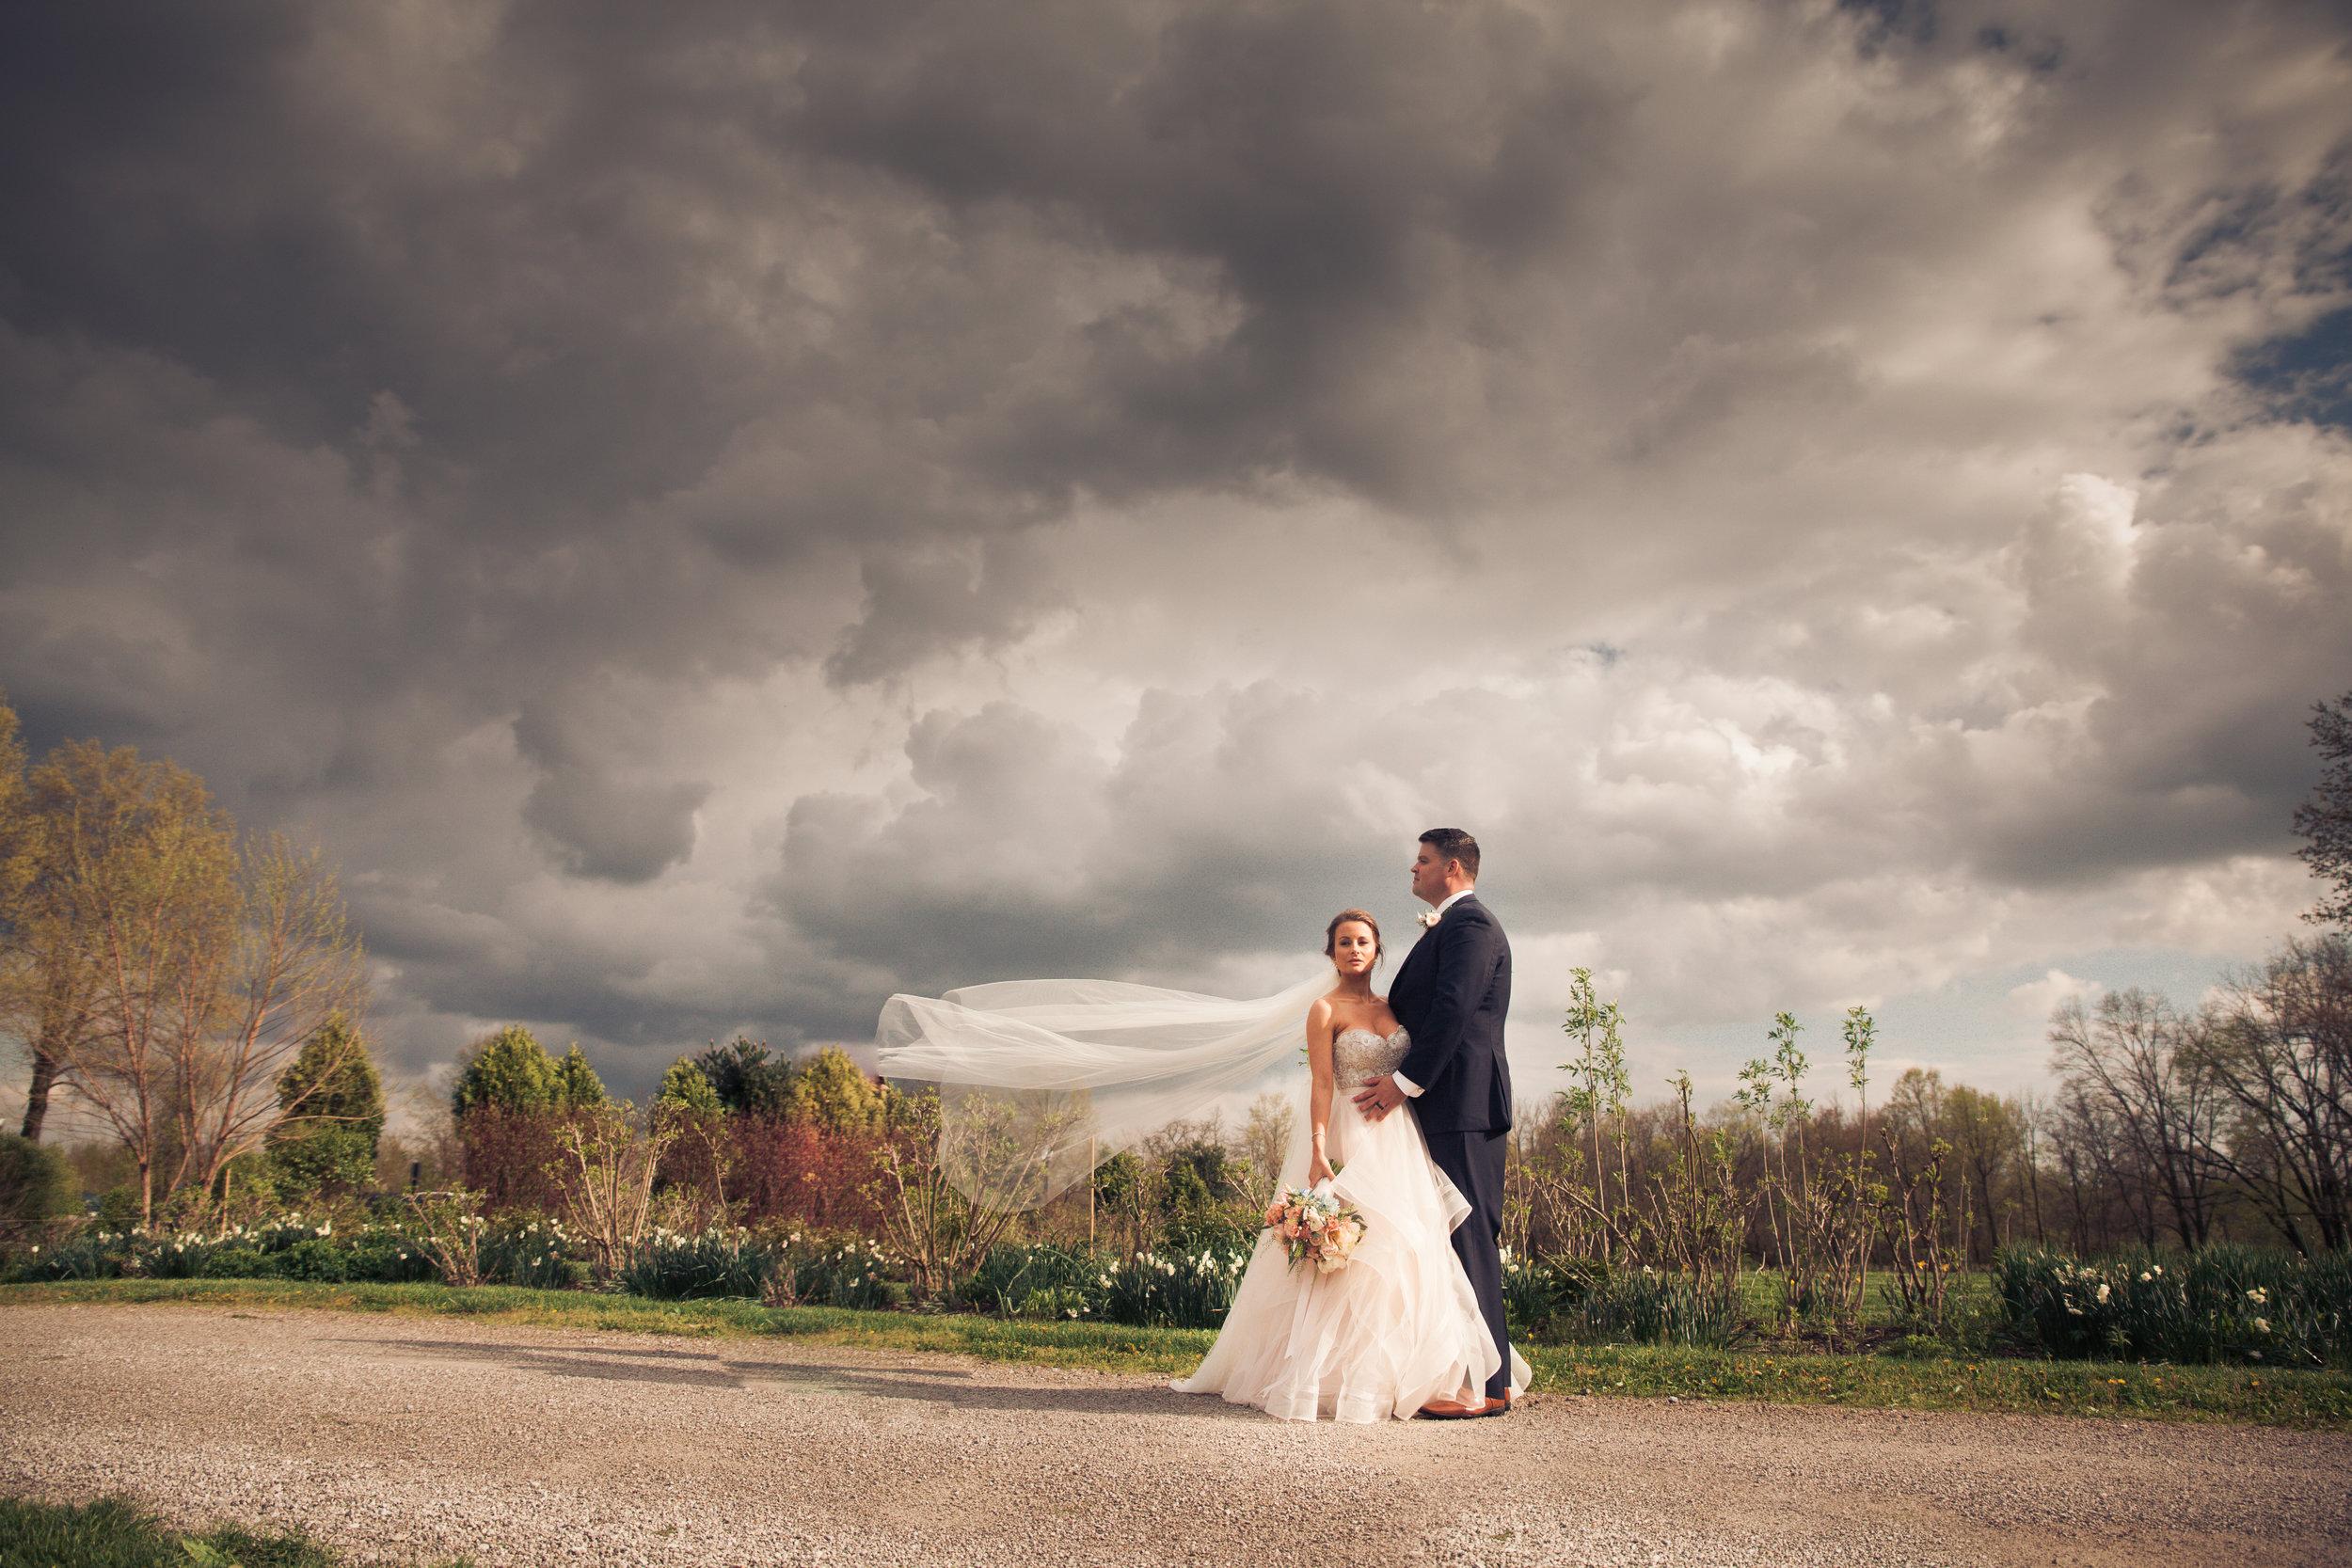 high end wedding photographer in columbus